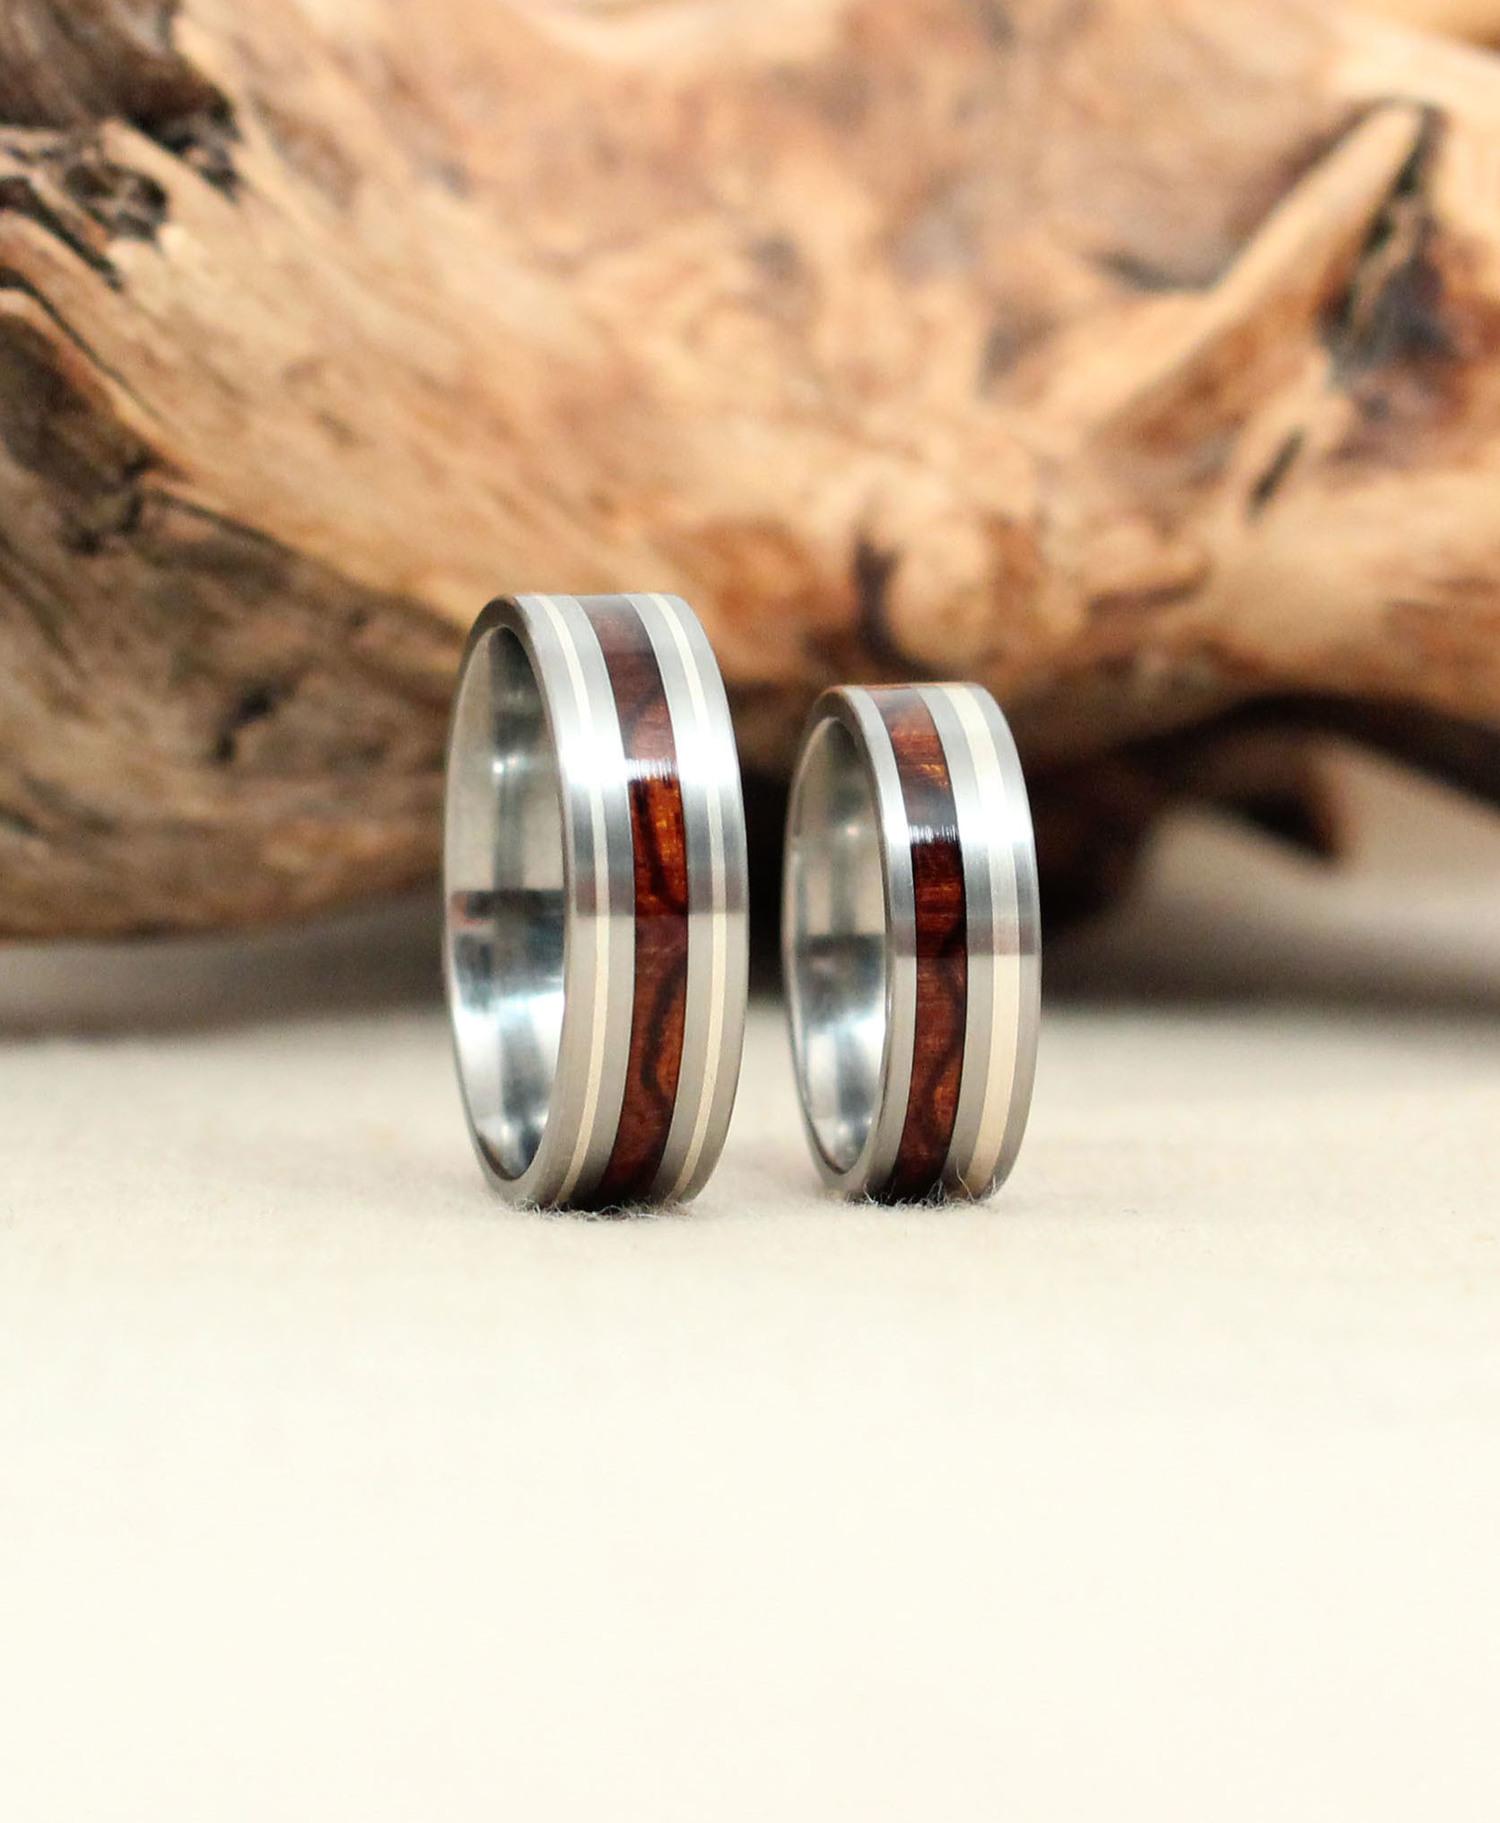 Arizona Desert Ironwood Burl with Silver Stripes Titanium Rings